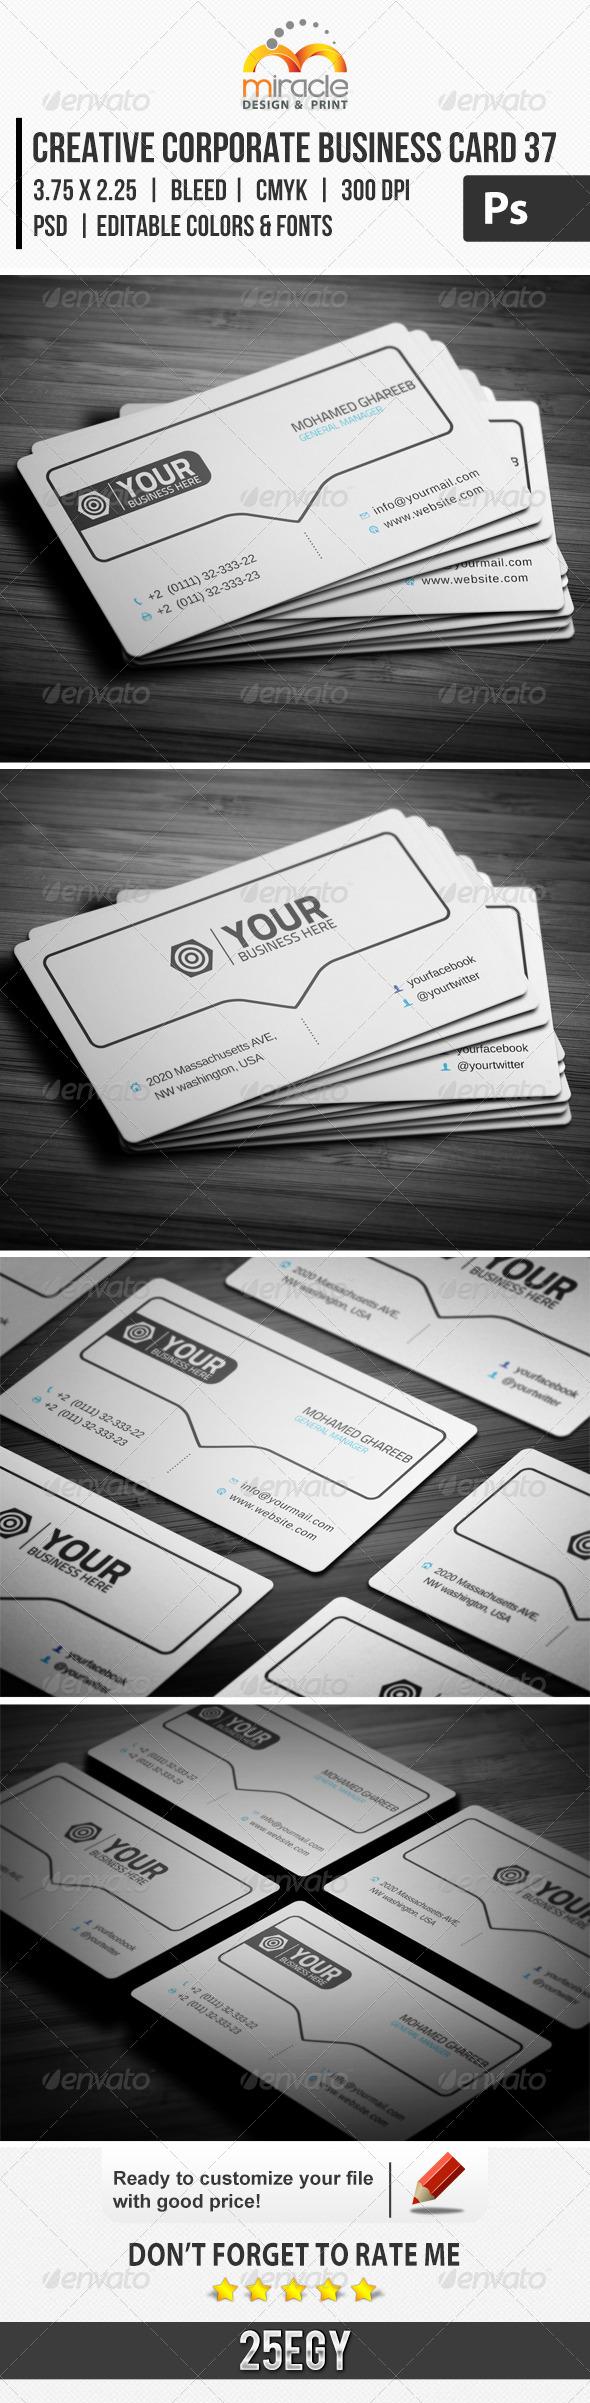 Creative Corporate Business Card 37